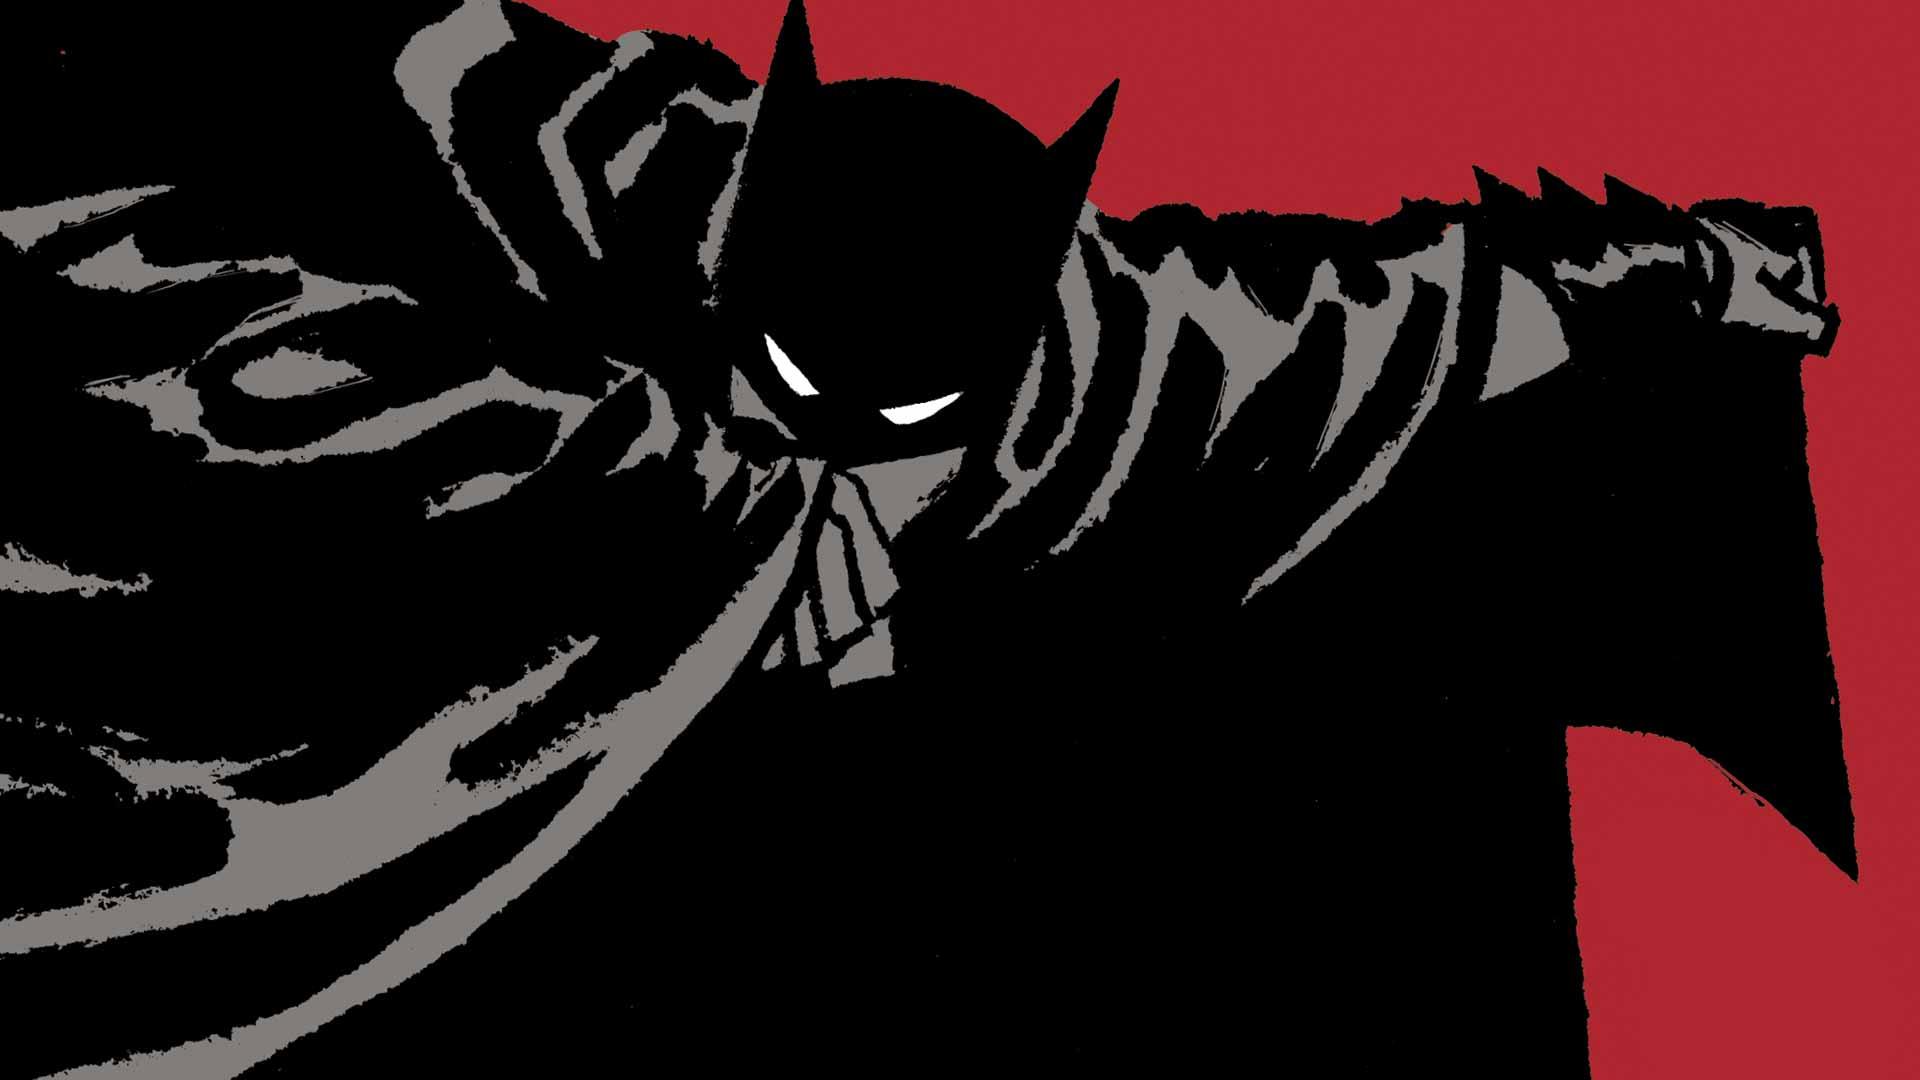 Top Wallpaper Halloween Batman - GalleryComics_1920x1080_20141105_BM_ESS_BMYO_1_543d9c450bff86  Gallery_28854.jpg